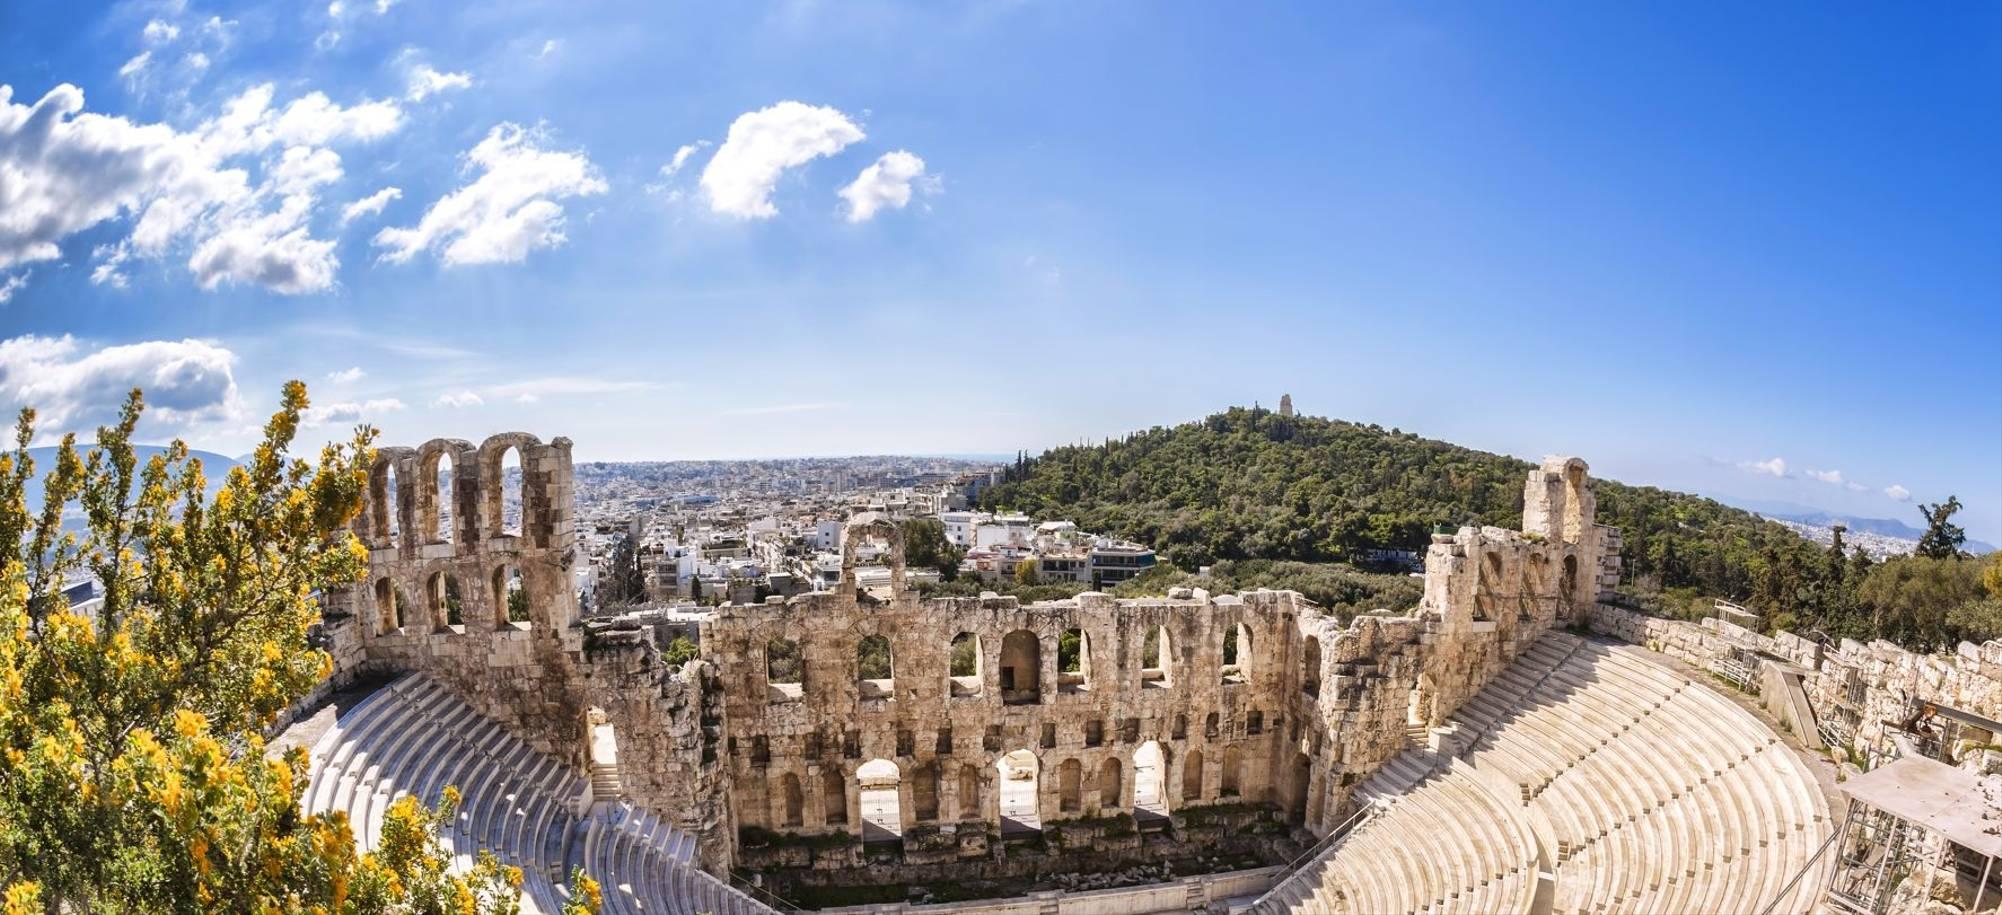 Athens (Piraeus), Amphitheater of Acropolis- Itinerary Desktop.jpg